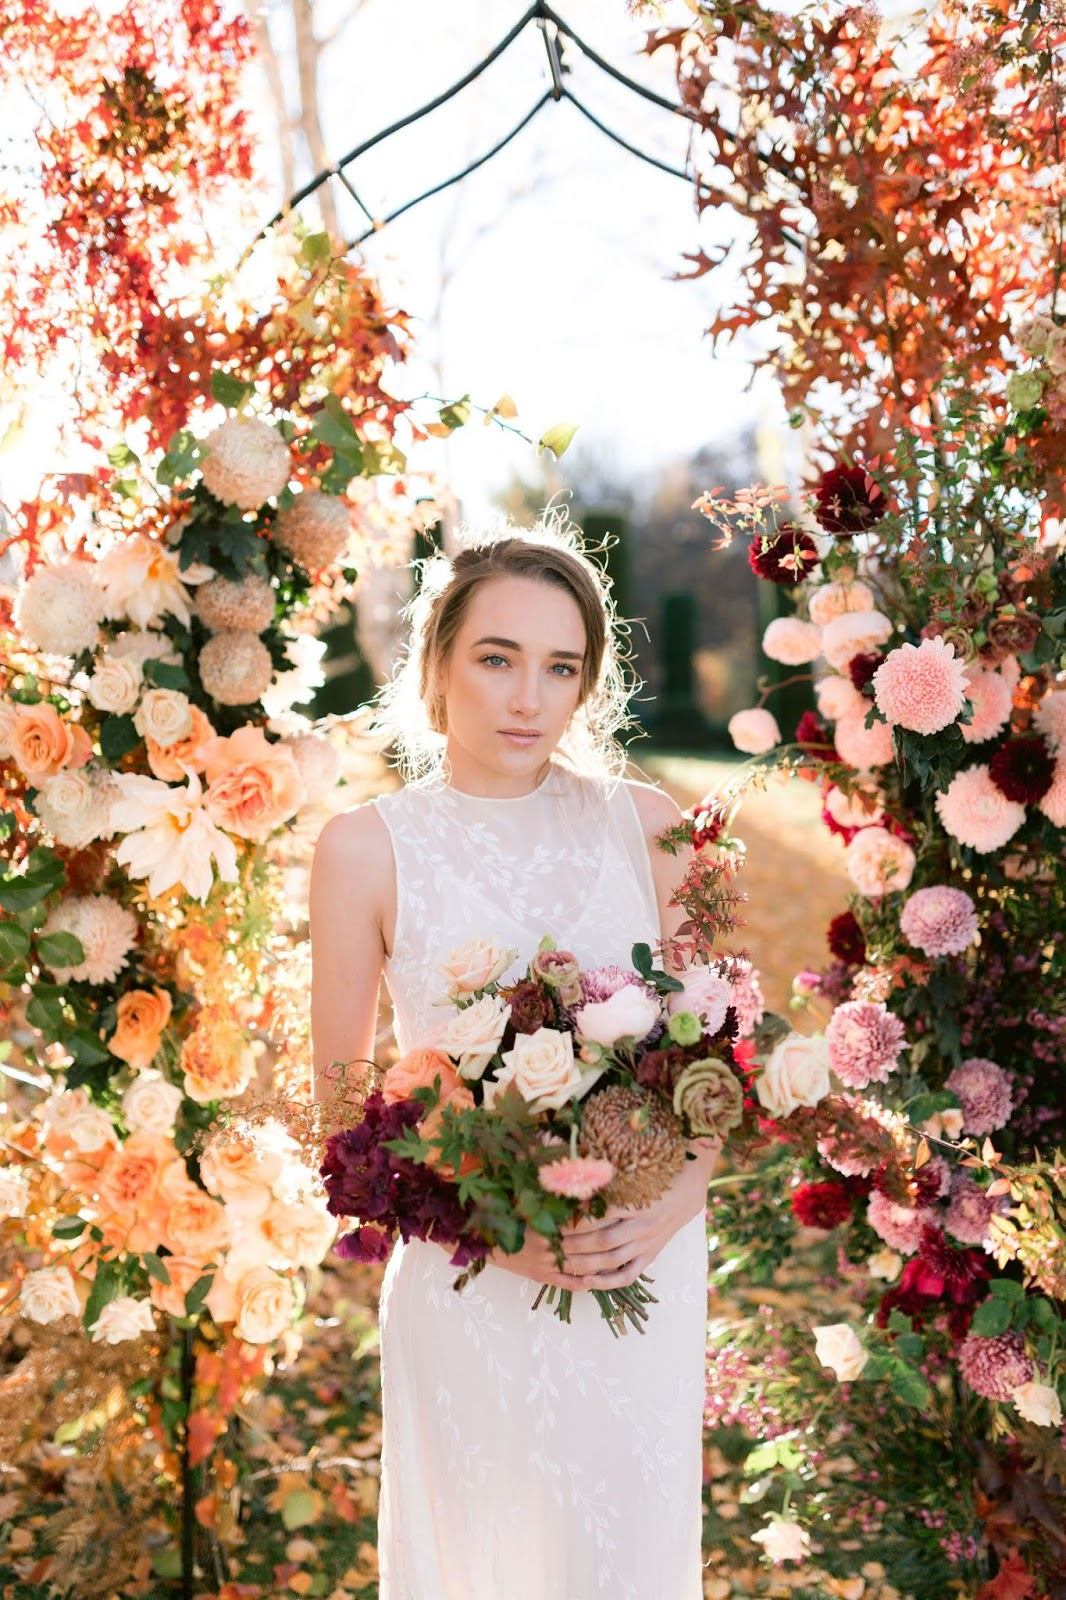 ella ottaviano photography to the aisle australia australian bridal designer hair makeup floral designer installation bouquet